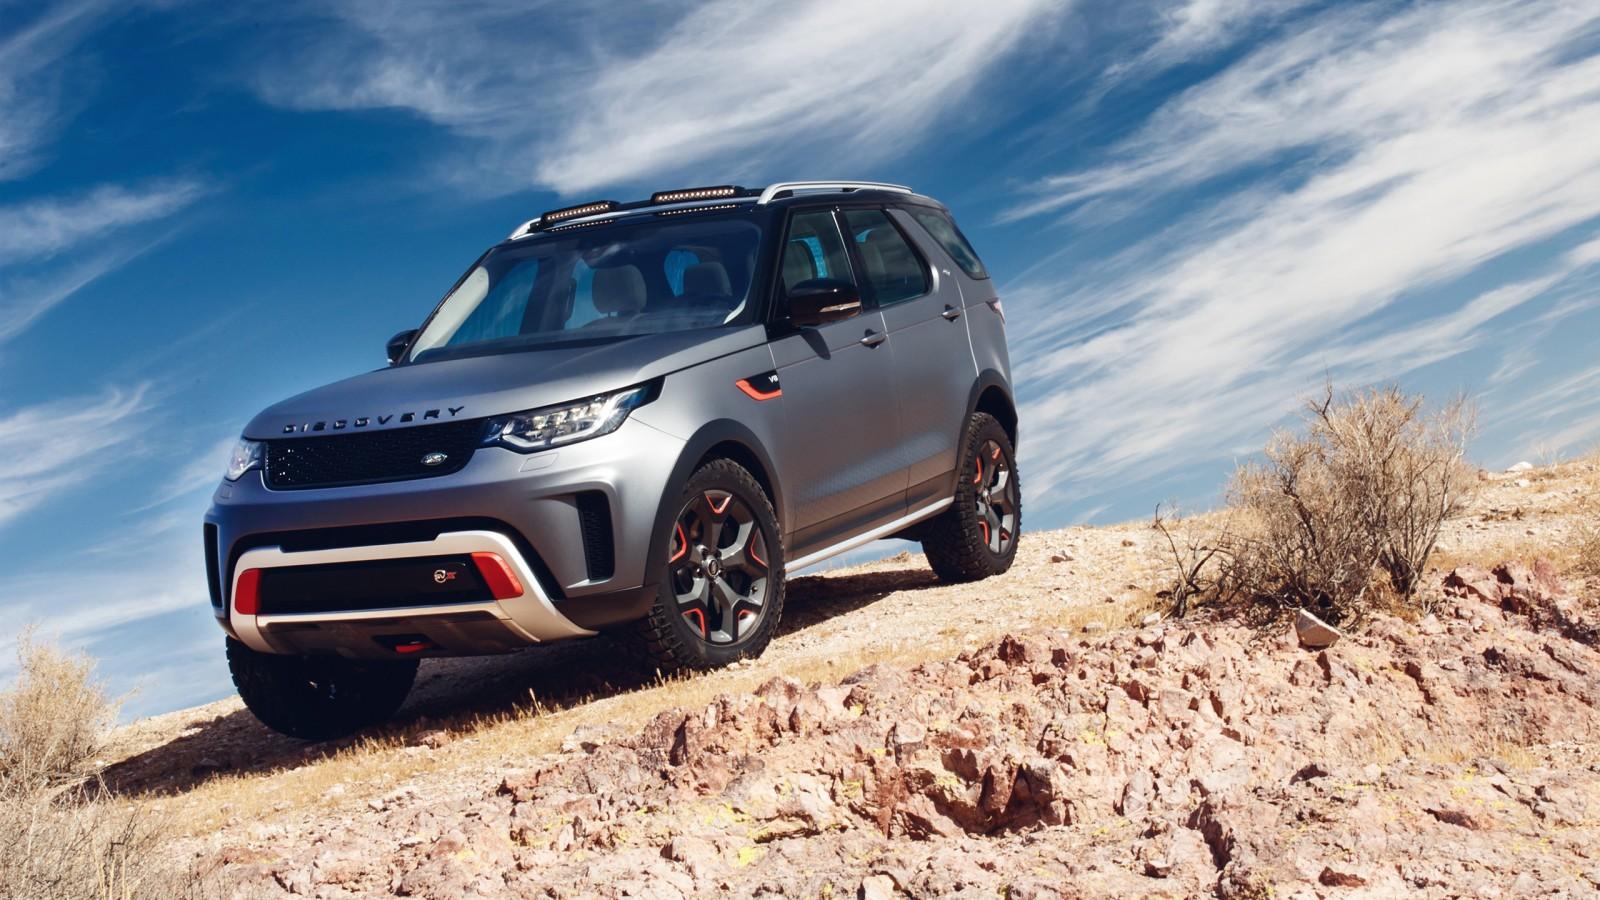 2018 Land Rover Discovery SVX 2 Wallpaper | HD Car ...